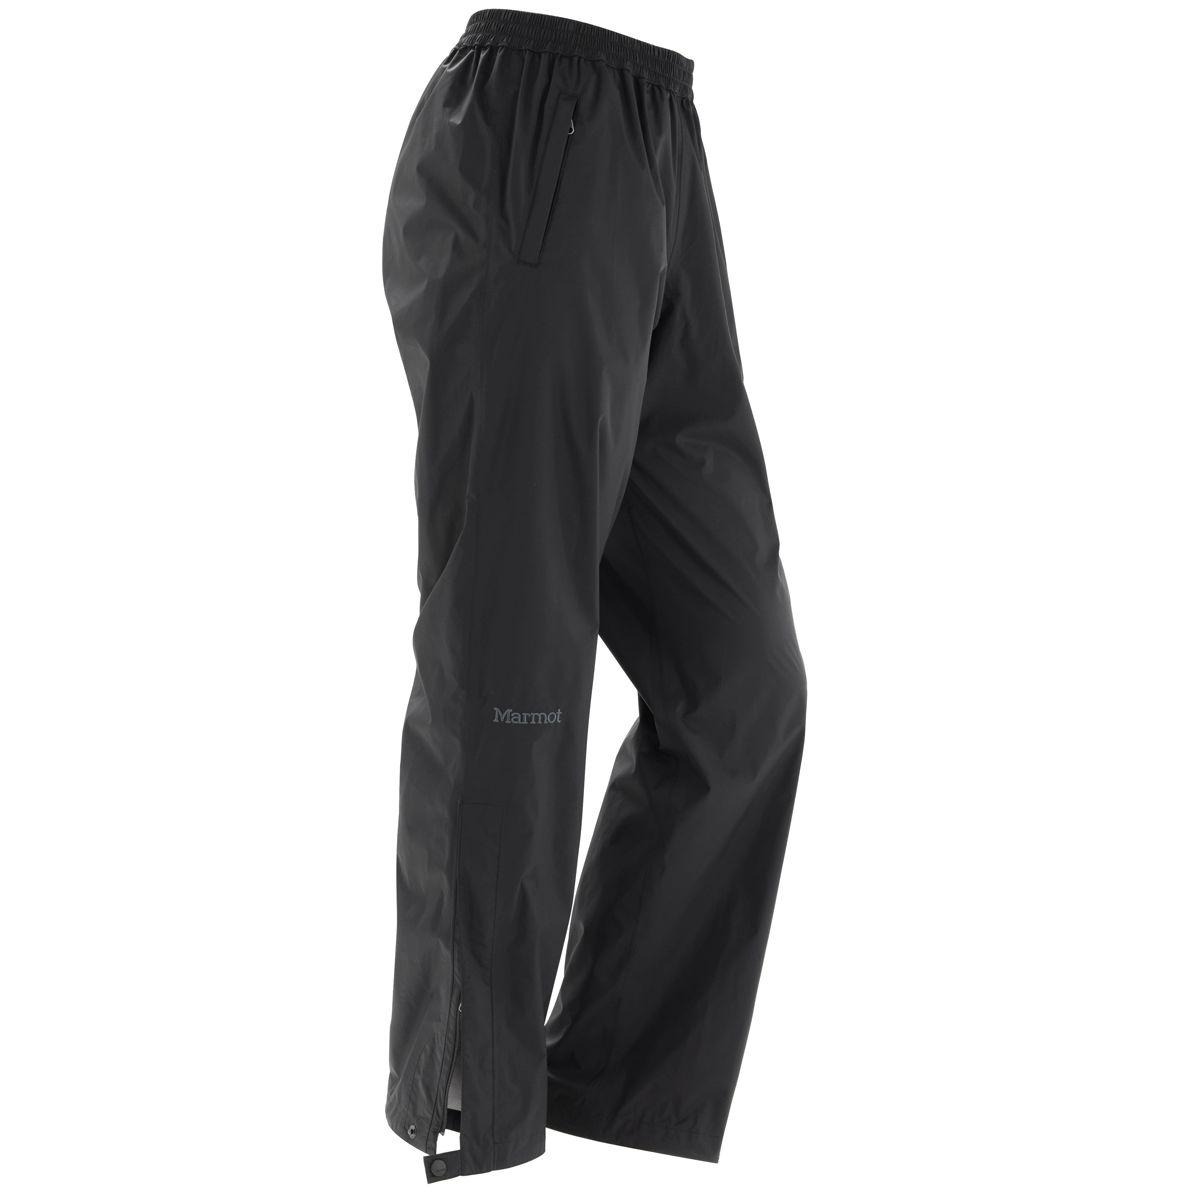 Marmot Women's Precip Pants - Black, XL